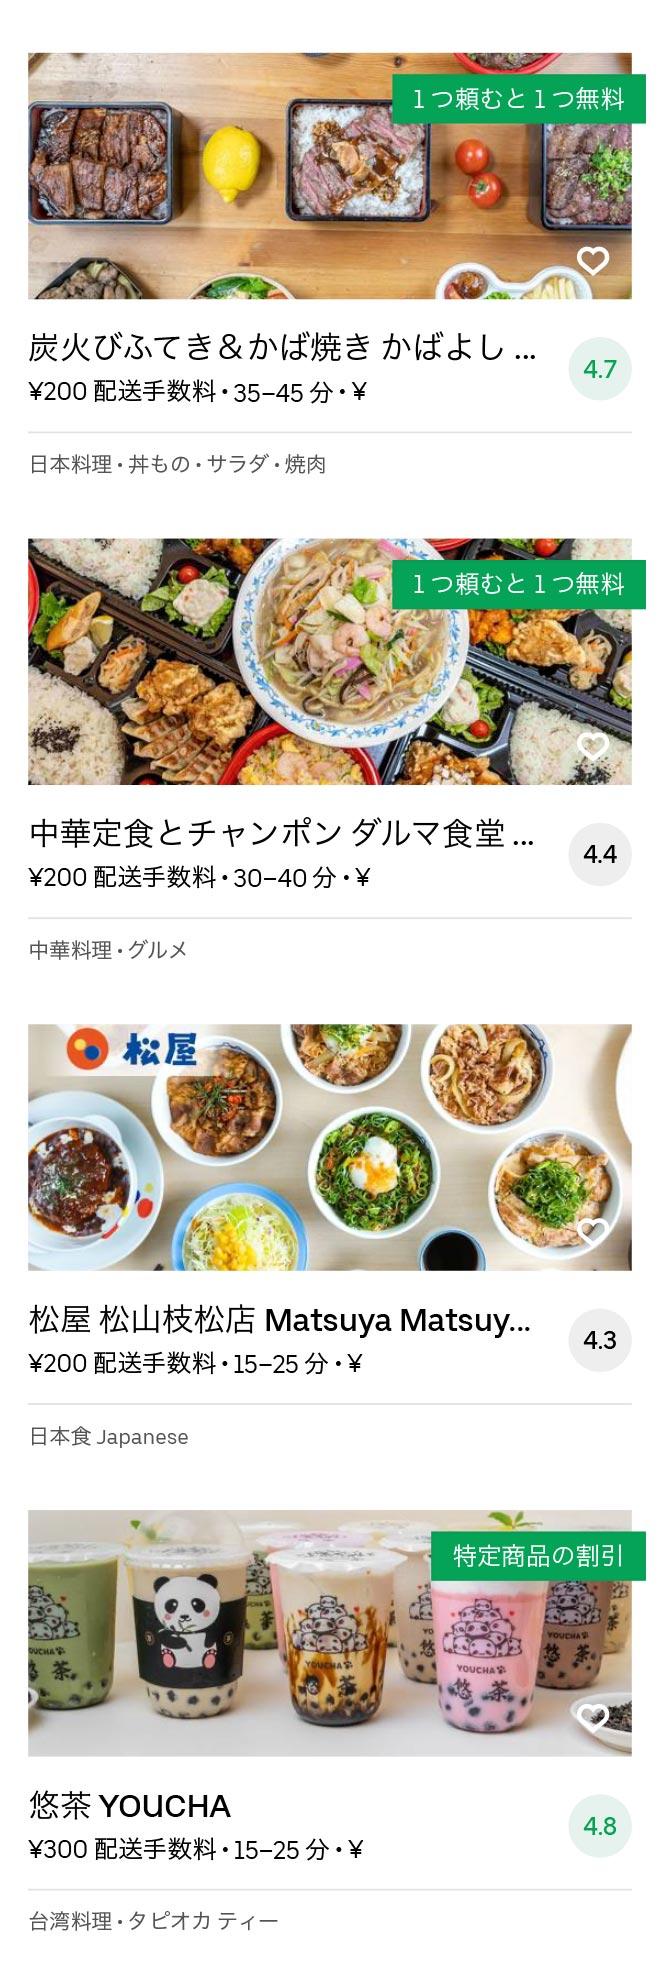 Kitakume menu 2010 07